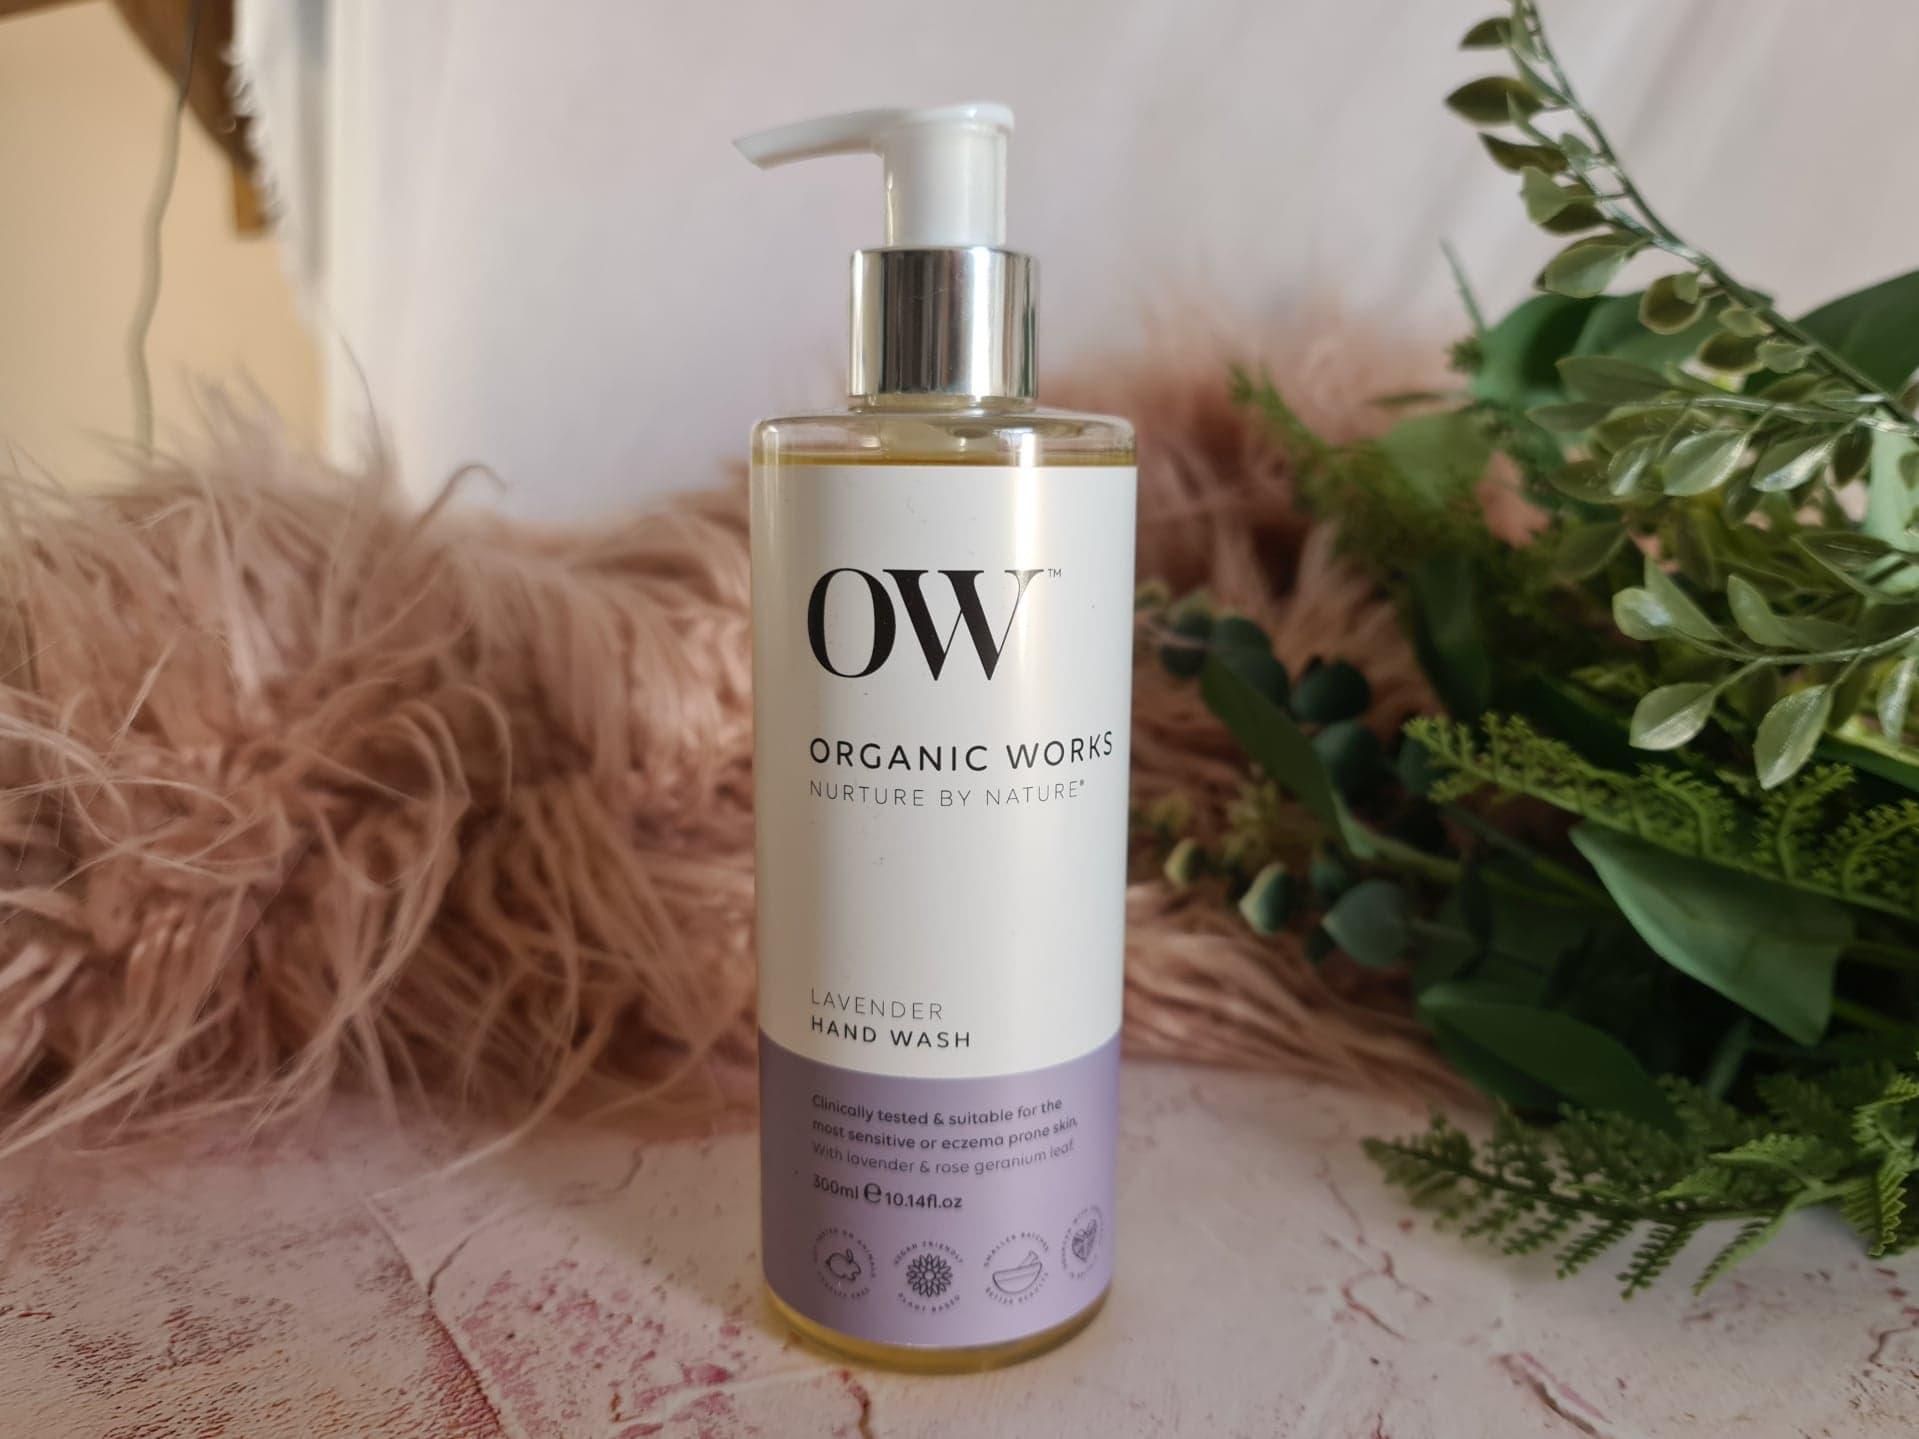 Organic Works Lavender Hand Wash